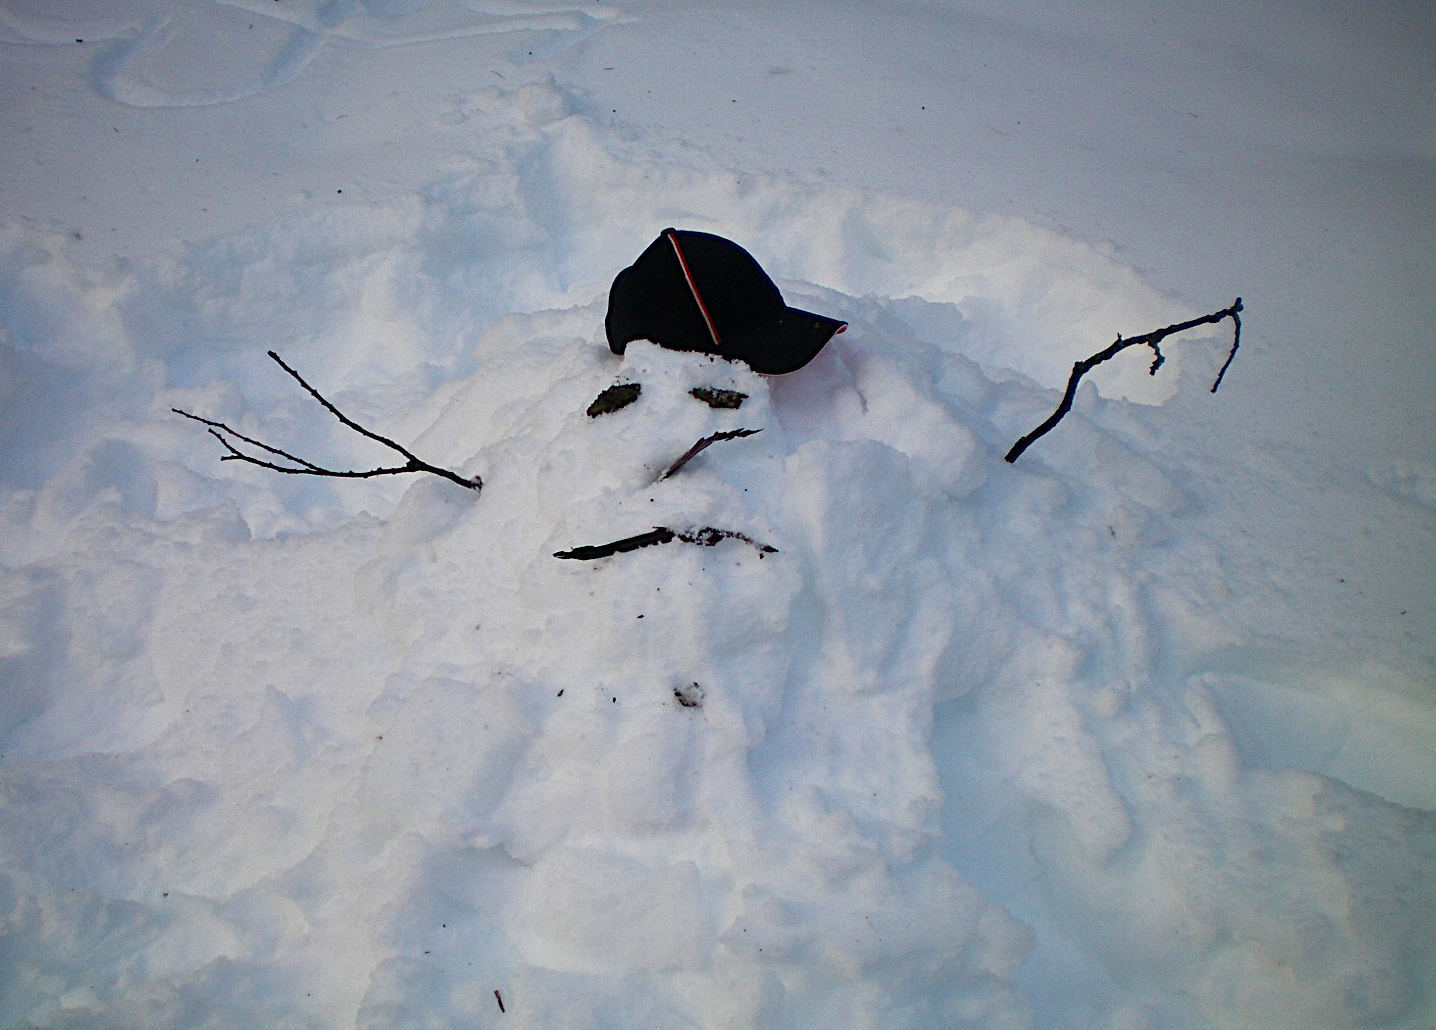 Sad Snowman Melting Spring Vector Illustration Stock ...  |Sad Melting Snowman